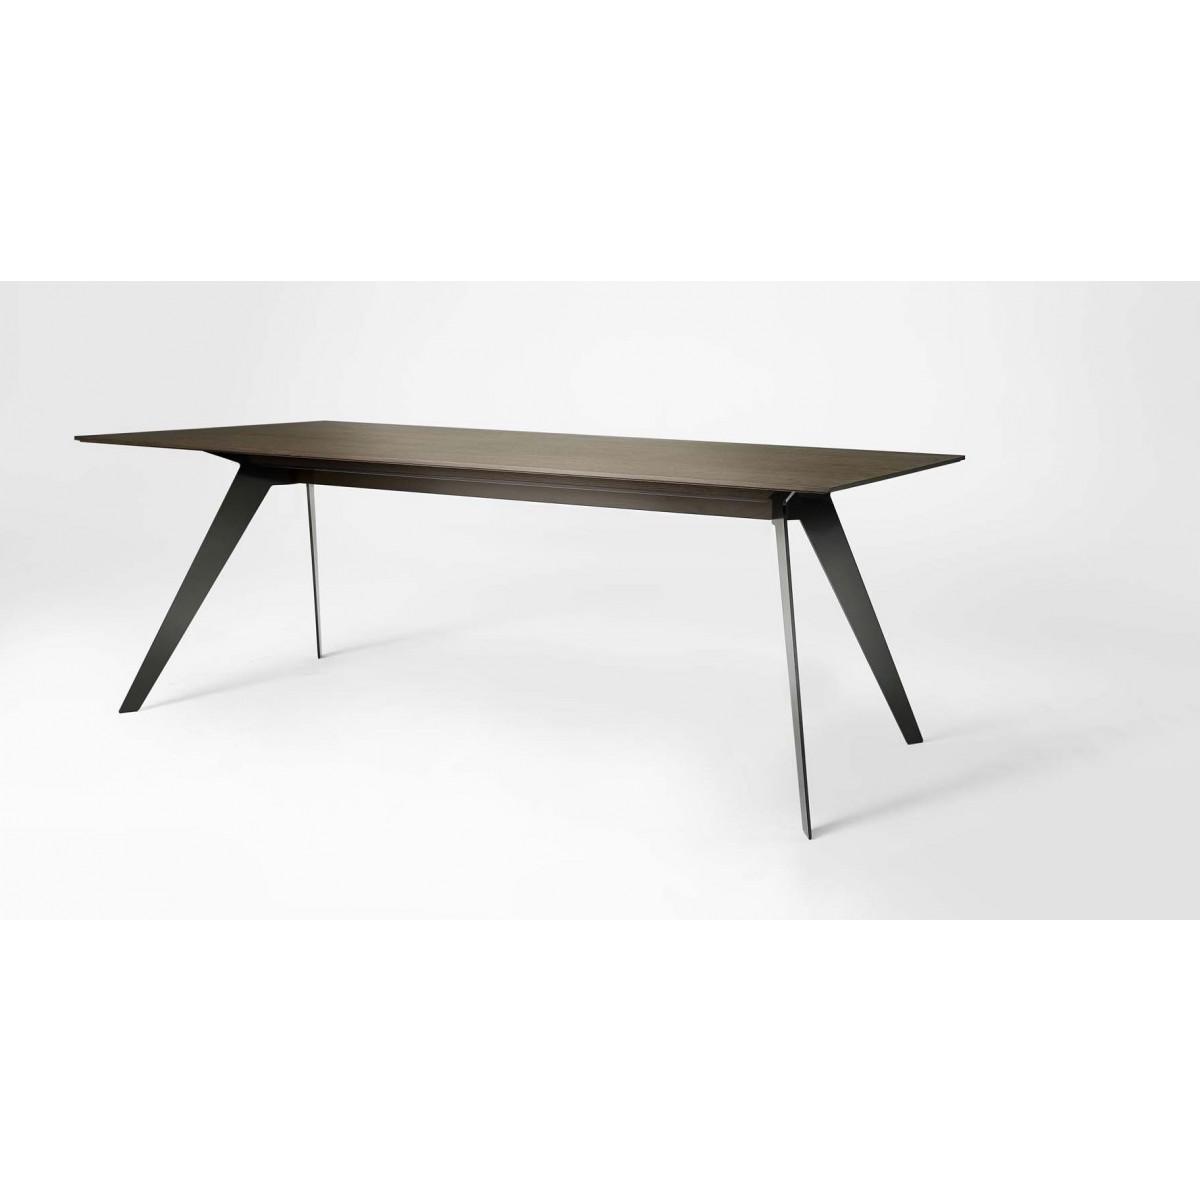 eetkamertafel-eettafel-bloom-vast-mintjens-furniture-miltonhouse-modern-metalen-poot